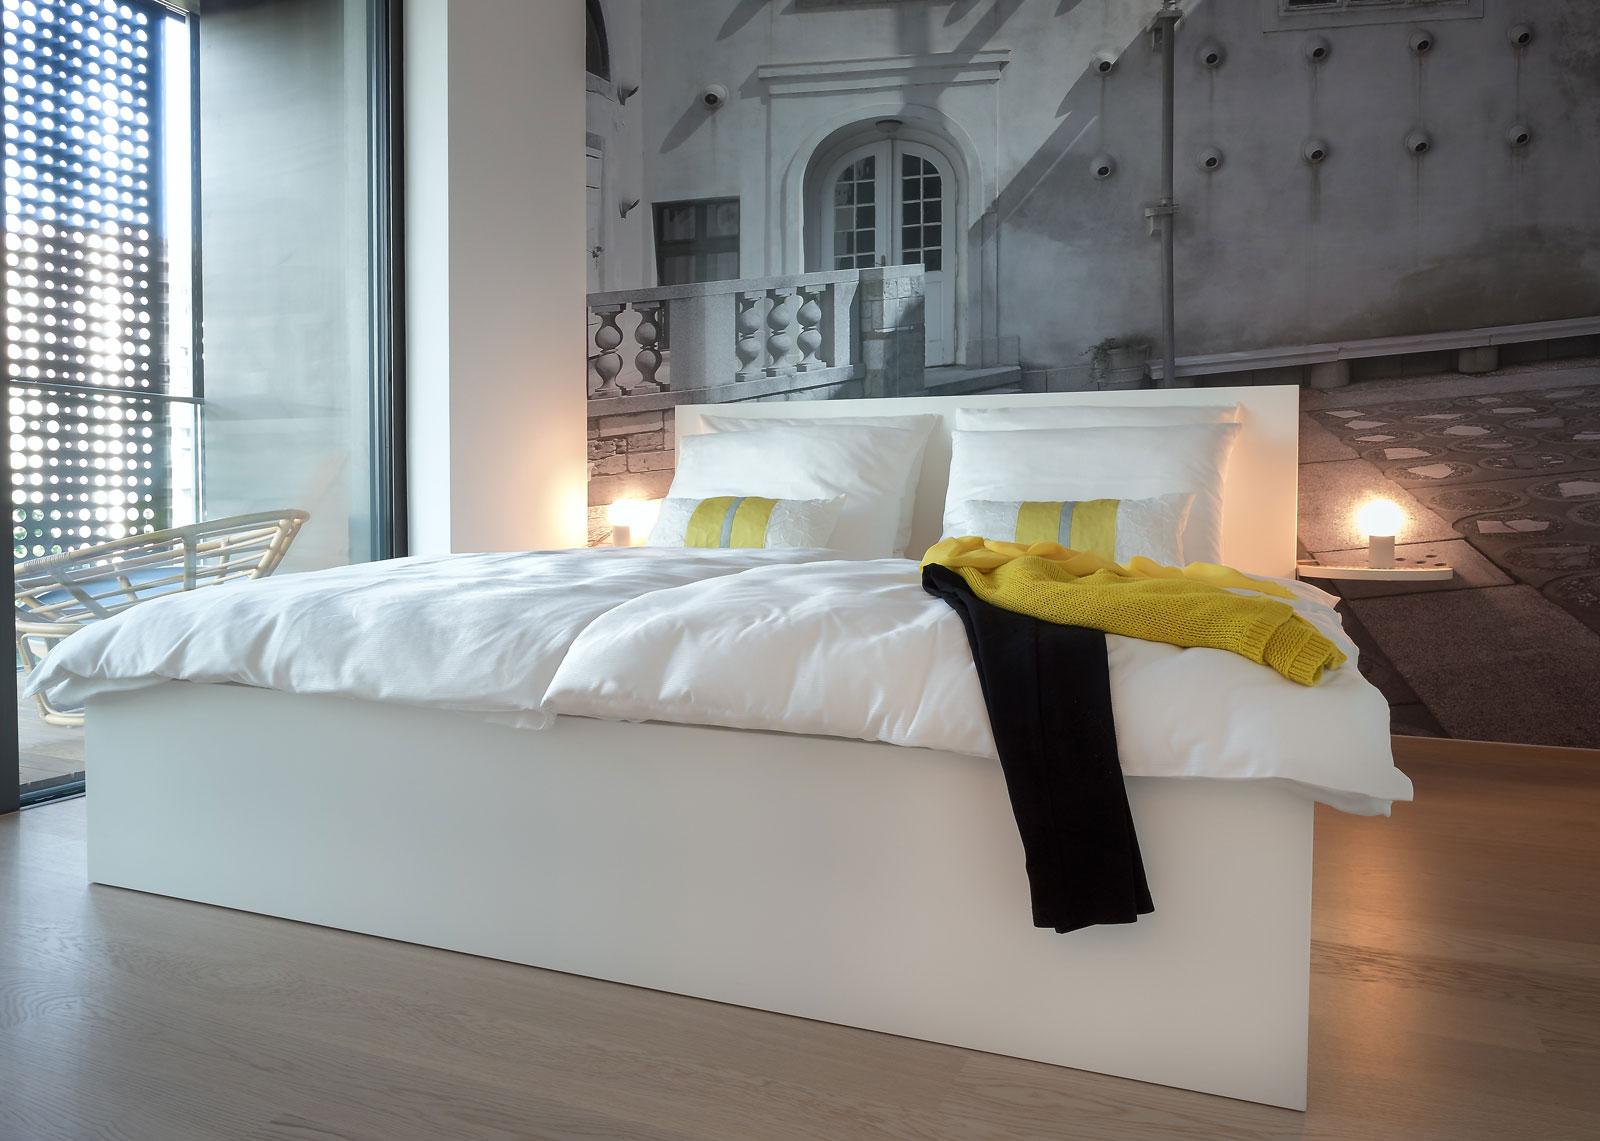 Apartment in Ljubljana by GAO architects-15